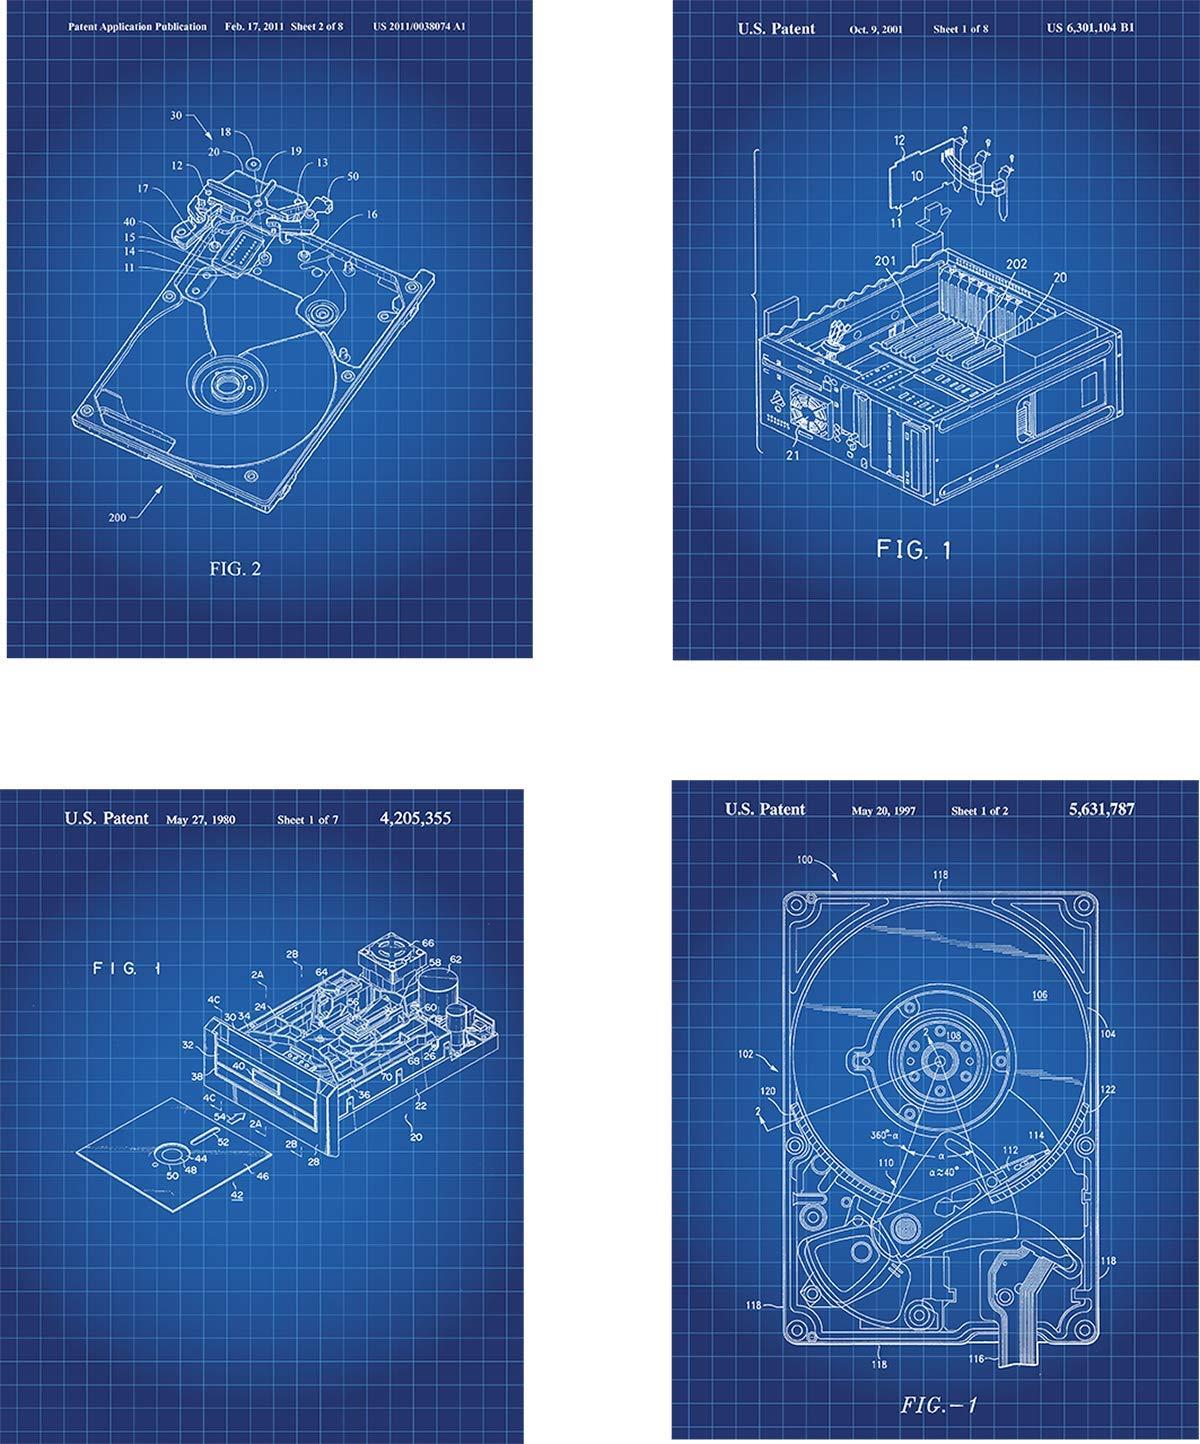 8x10 Hard Drive Patent Wall Art Prints Unframed set of Four wall art decor for computer fans